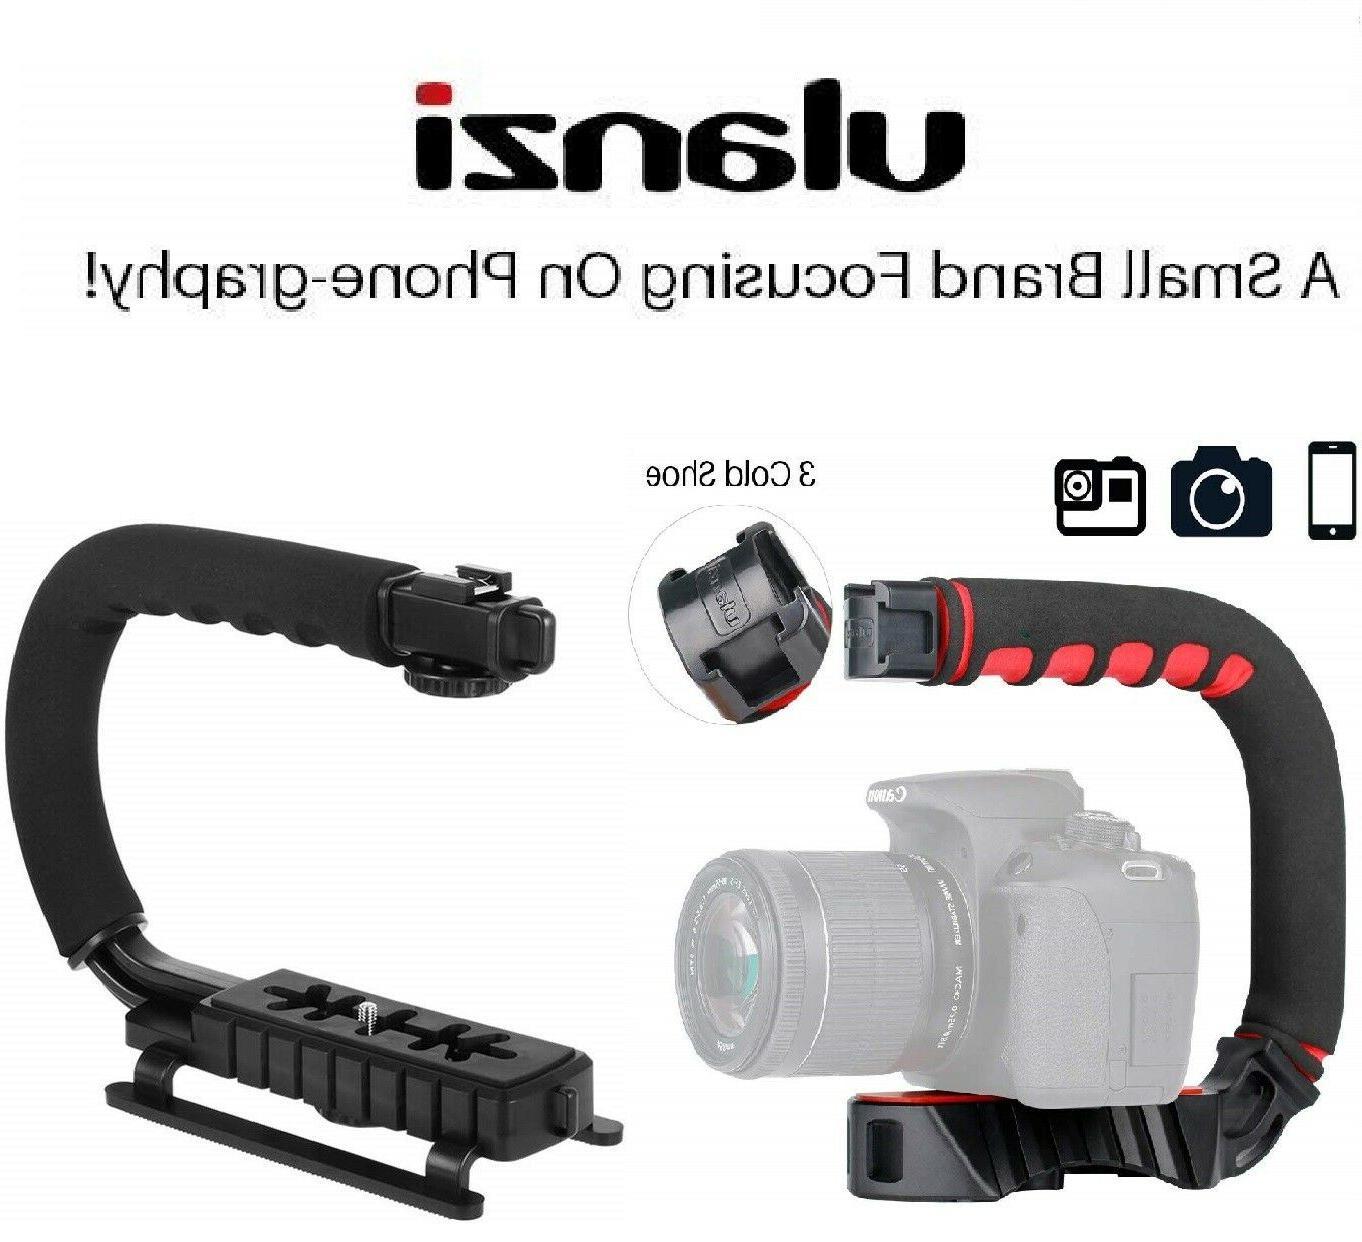 video stabilizer camera dslr handle grip rig